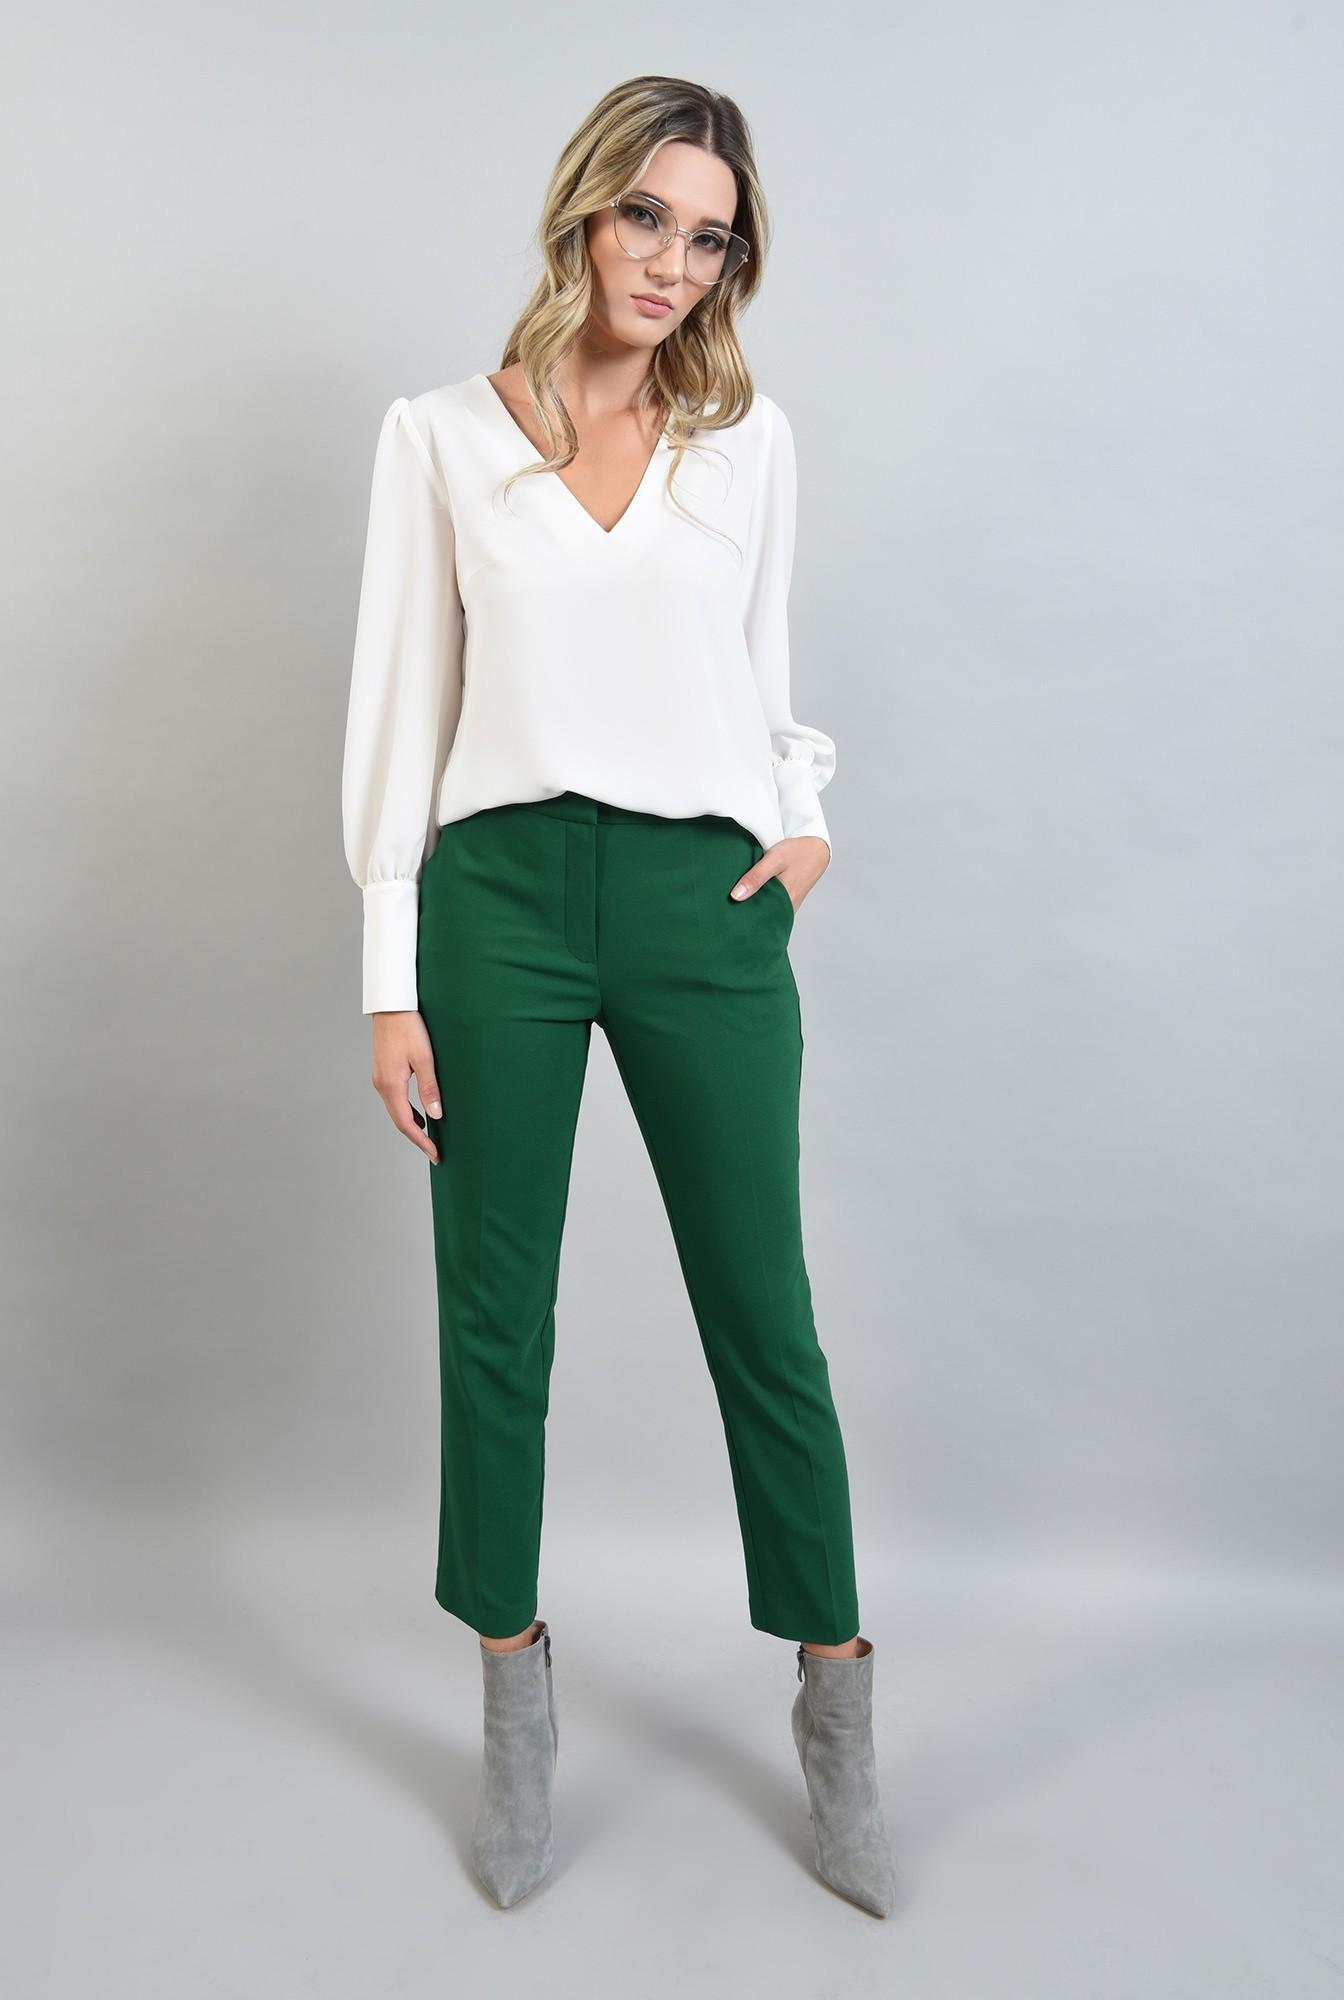 0 - pantaloni verzi, croi conic, Poema